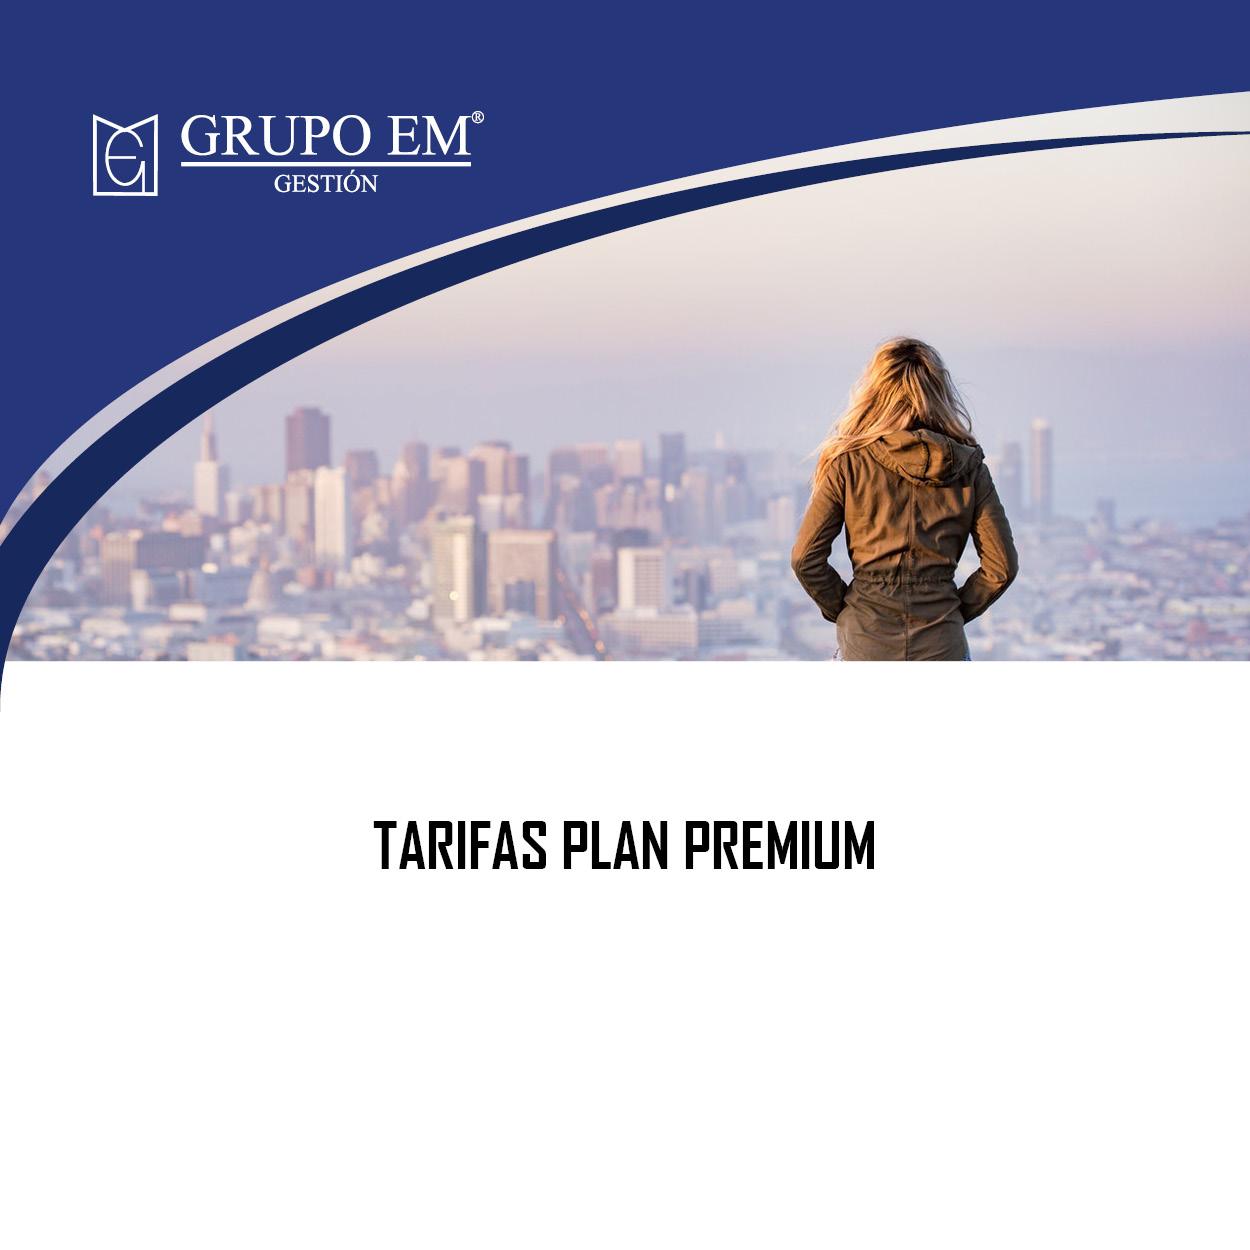 tarifas_diapo_PREMIUM